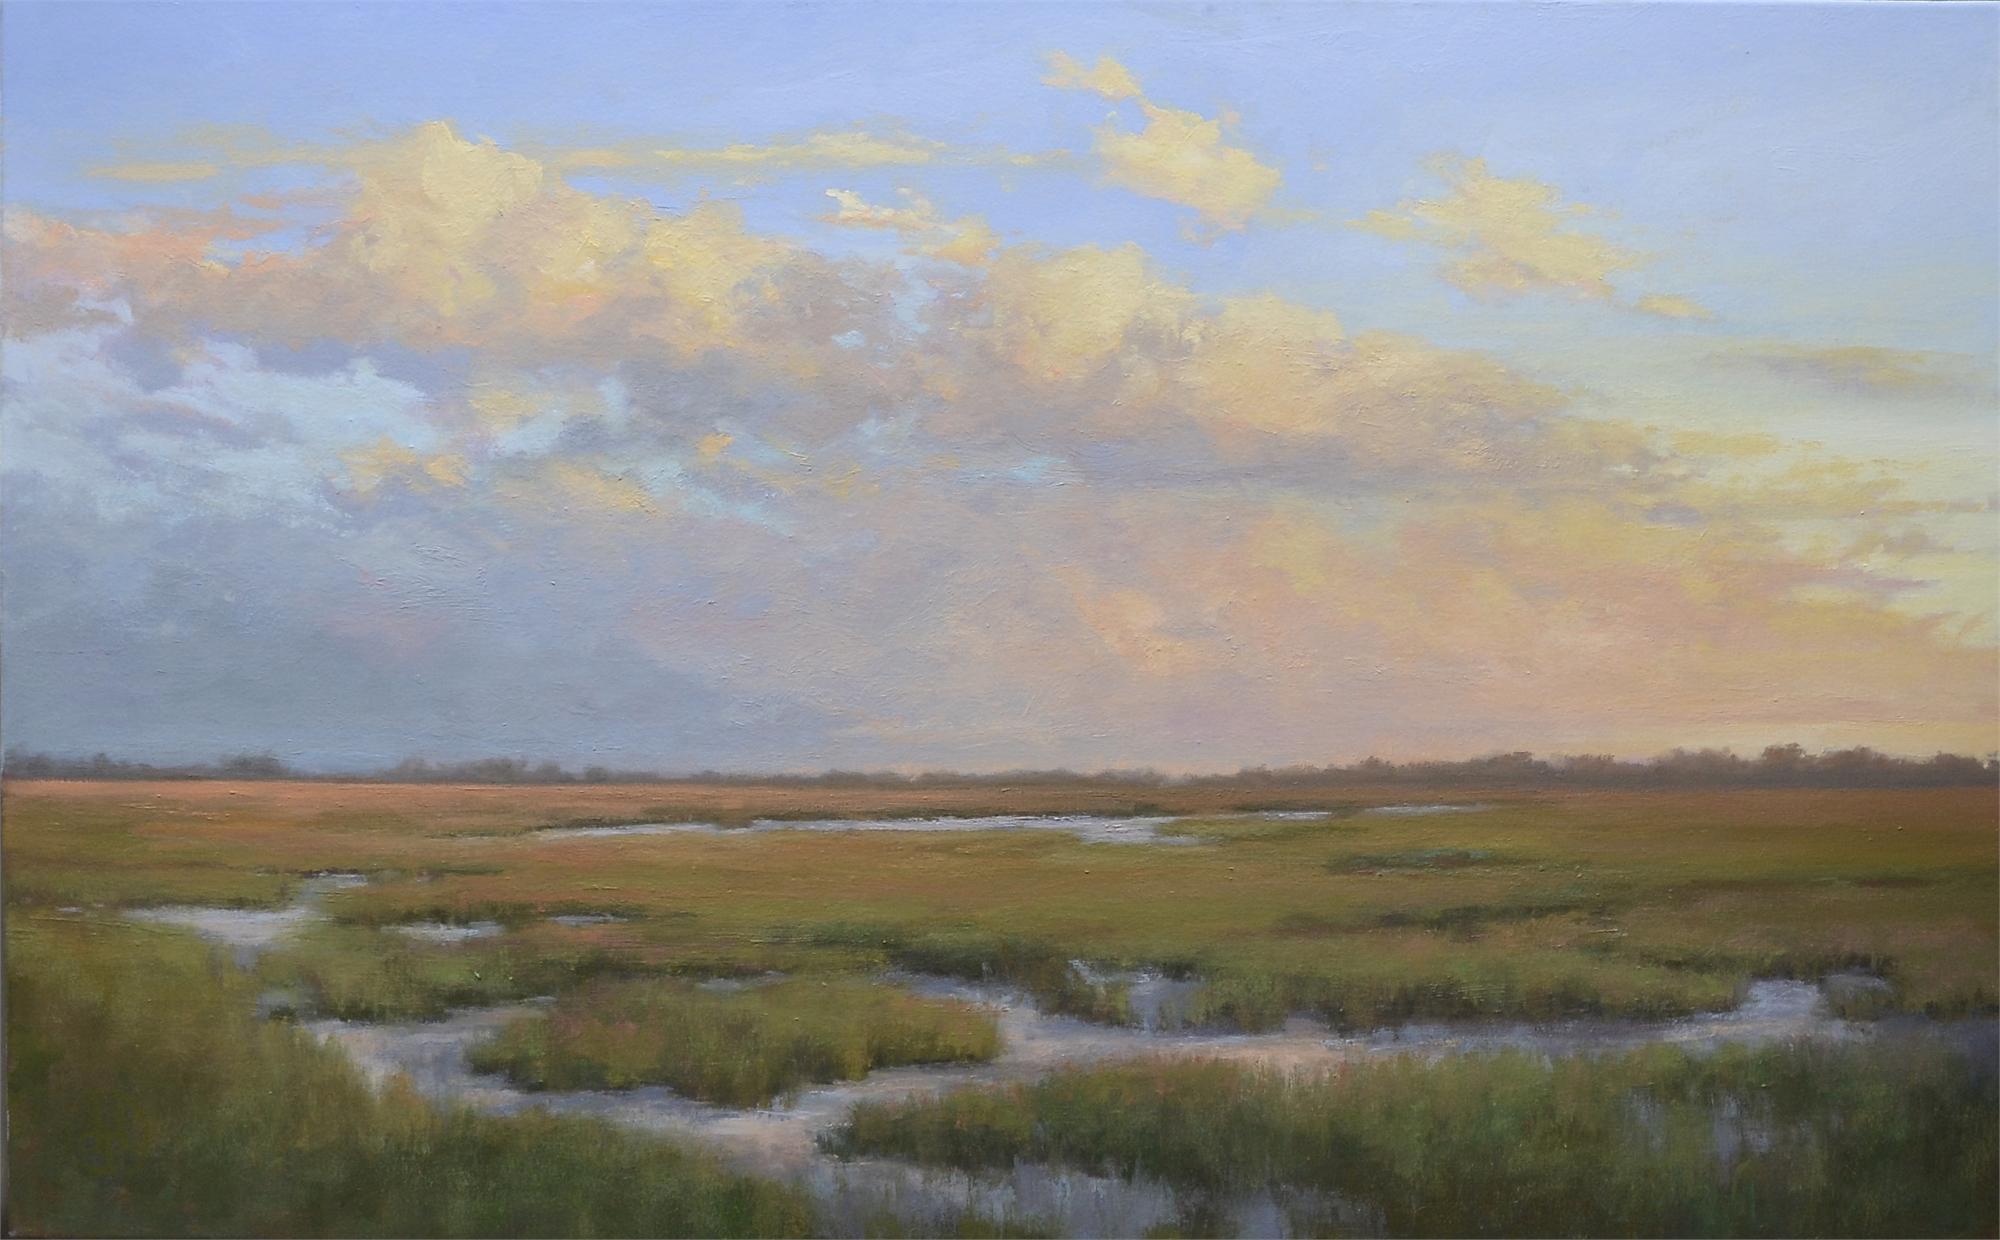 Evening Echoes by Dottie Leatherwood